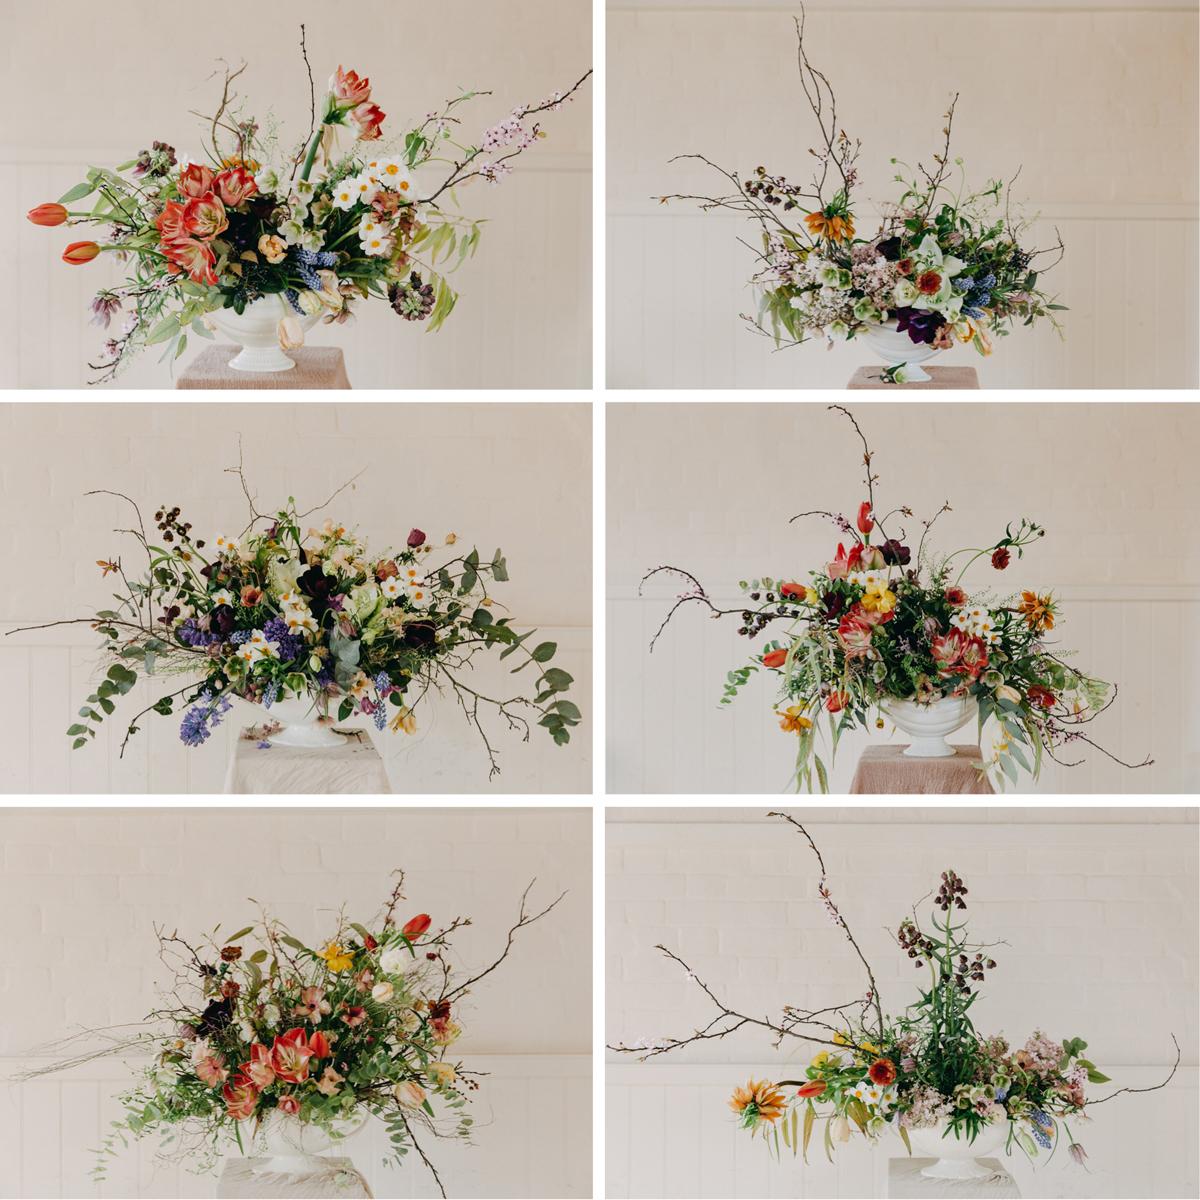 Flowers by (clockwise from top left: Nettlewood Flowers, Louise Langdon, Wild&Co Flowers, Eva Nemeth, SunsnRoses Flowers, Sebastian Conrad  Photos by Eva Nemeth